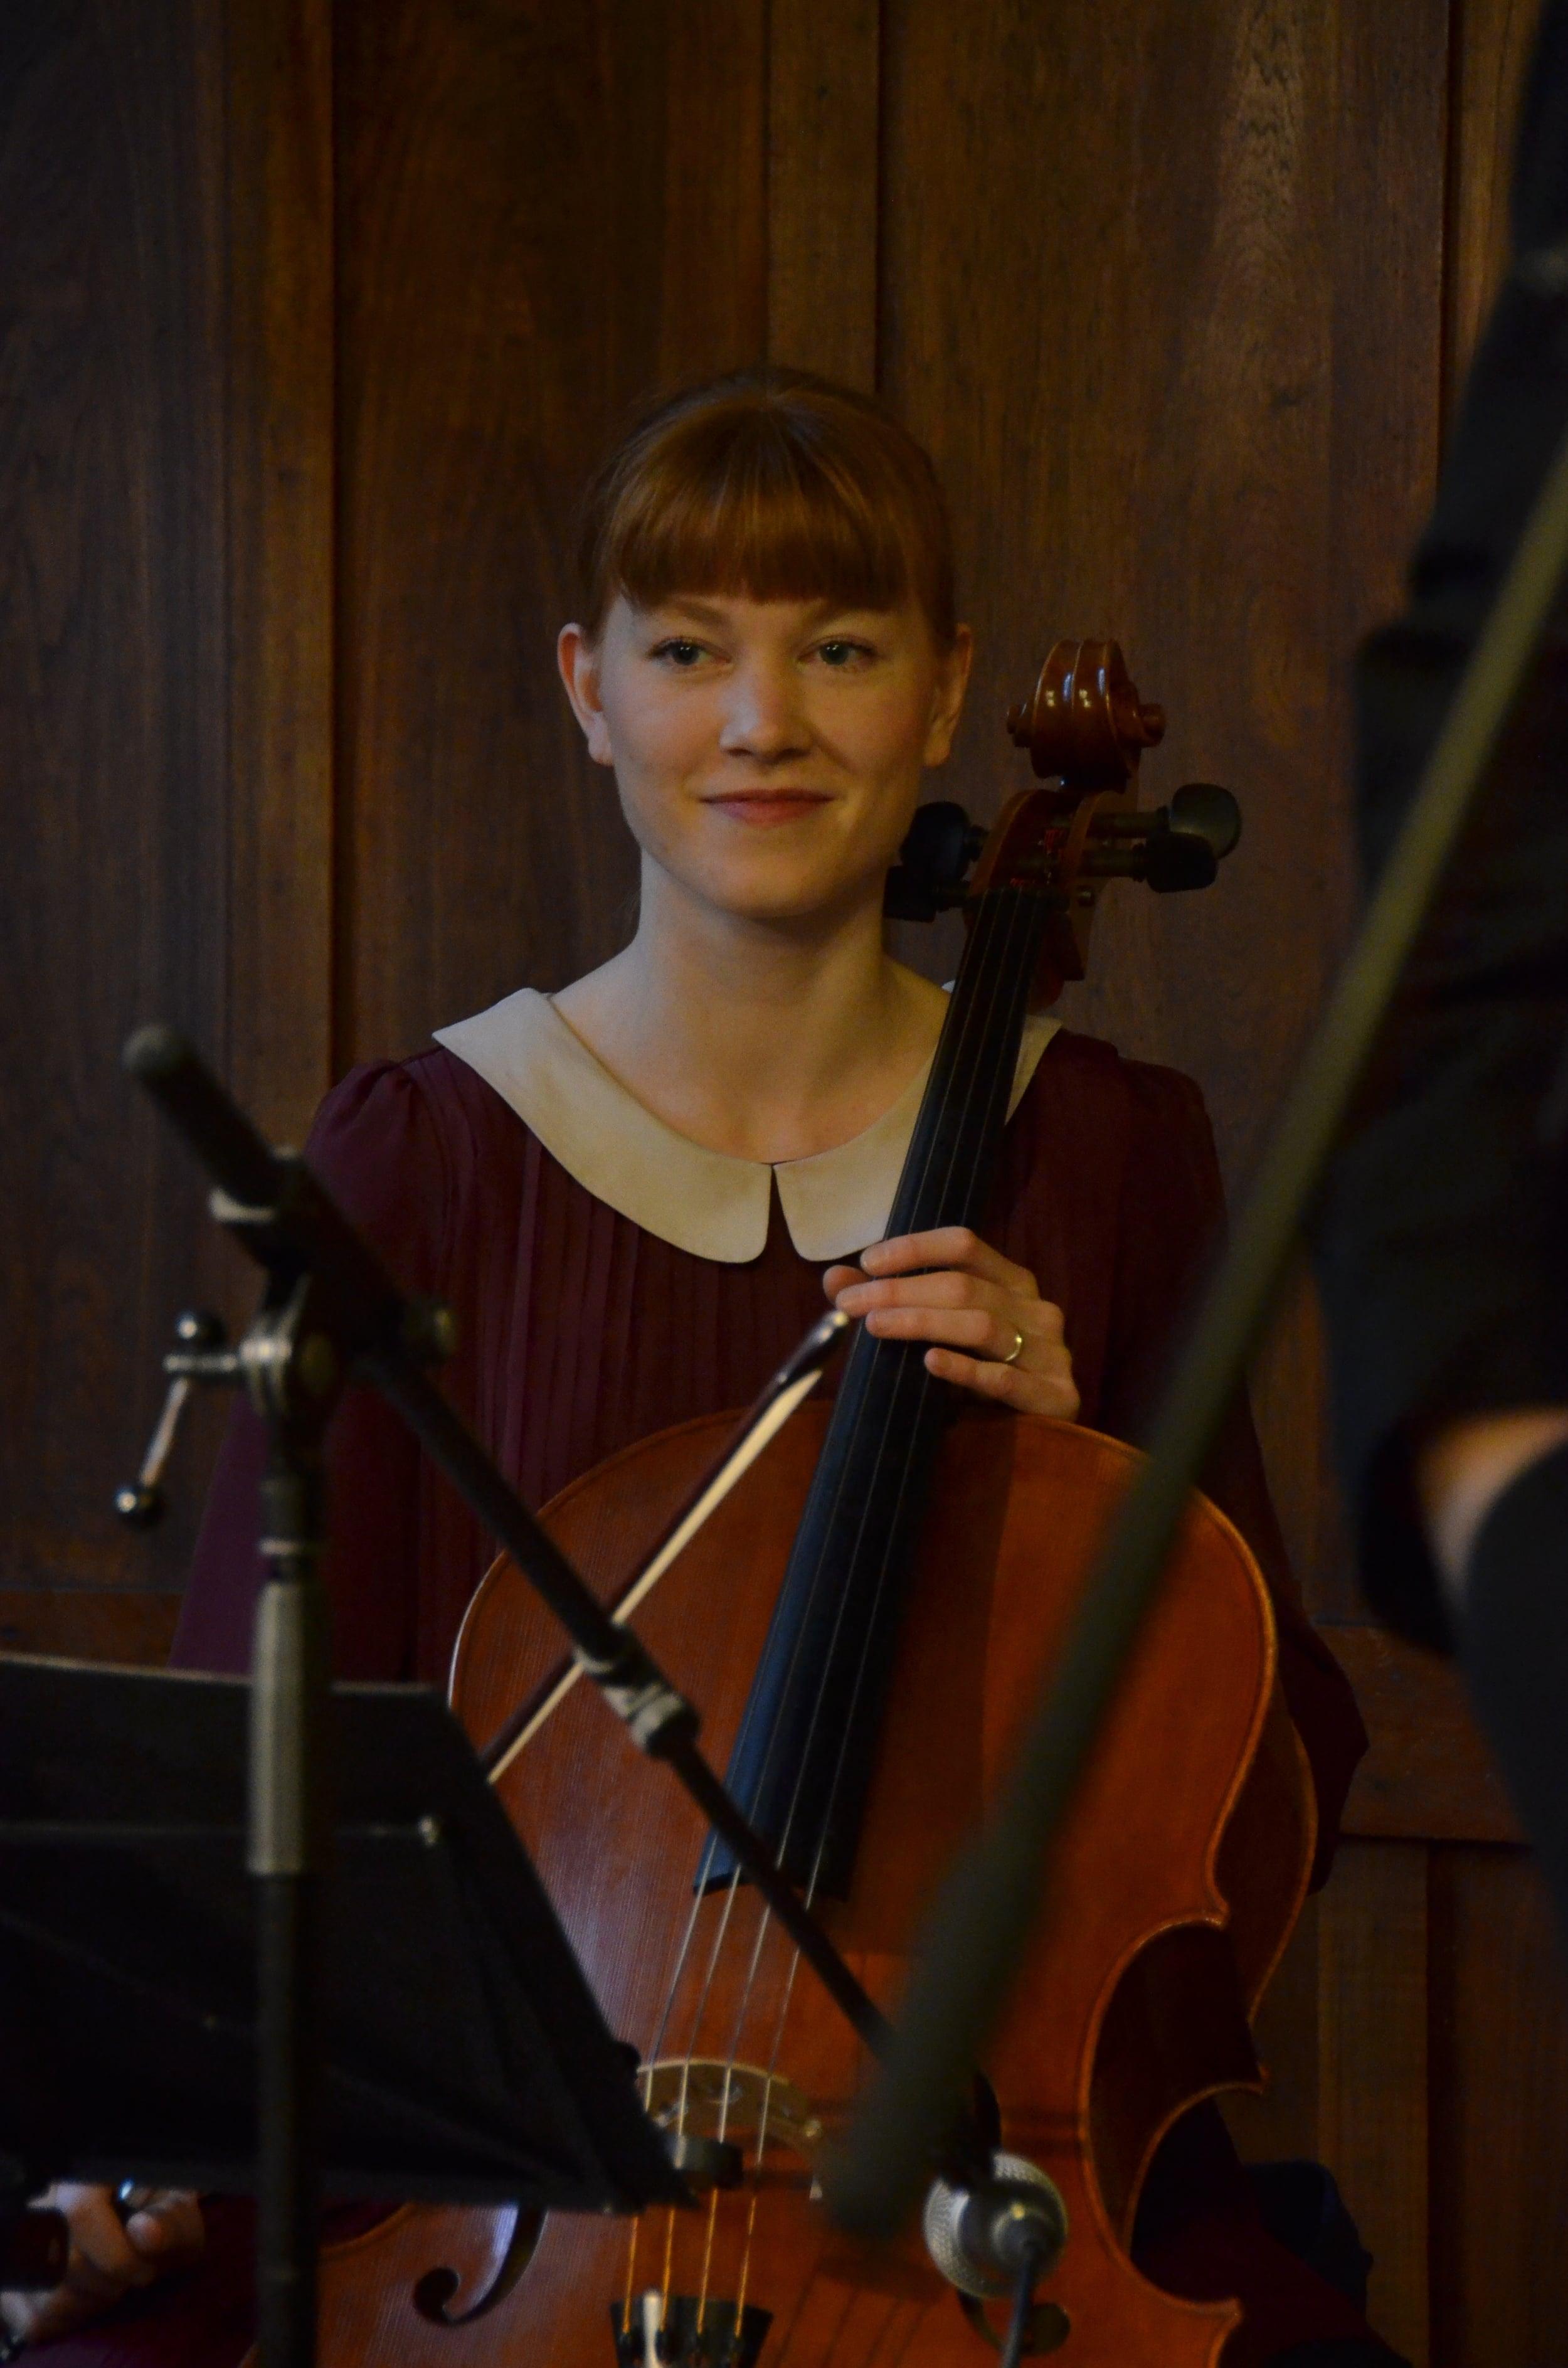 Julie Kathrine Joen Jensen - DSC_0135.JPG